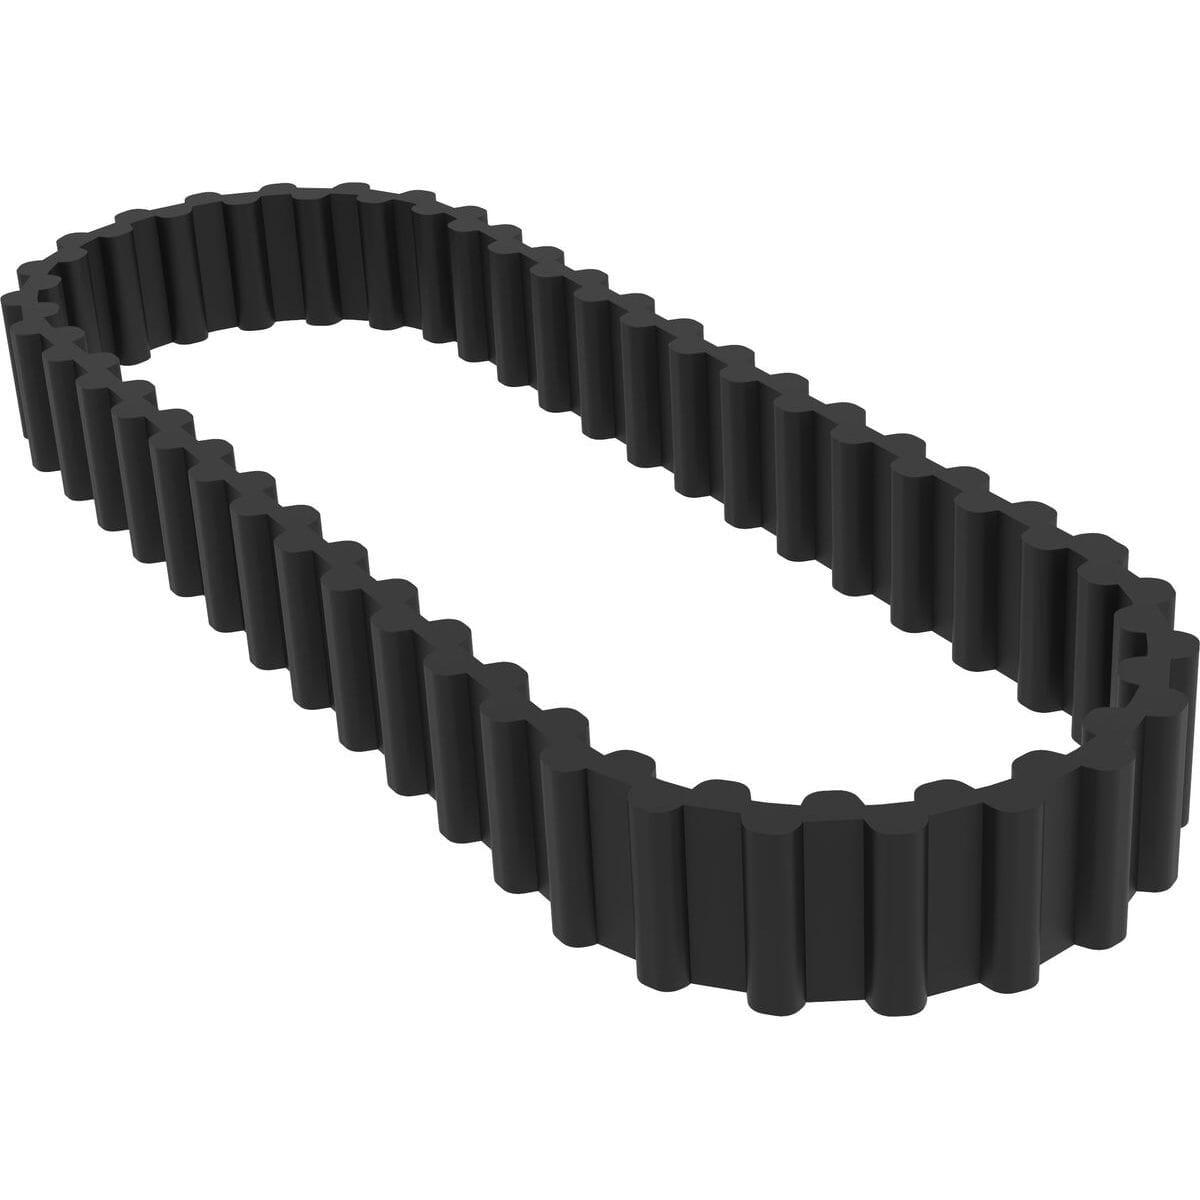 D/&D PowerDrive D480-3M-09 Double Sided Timing Belt Rubber